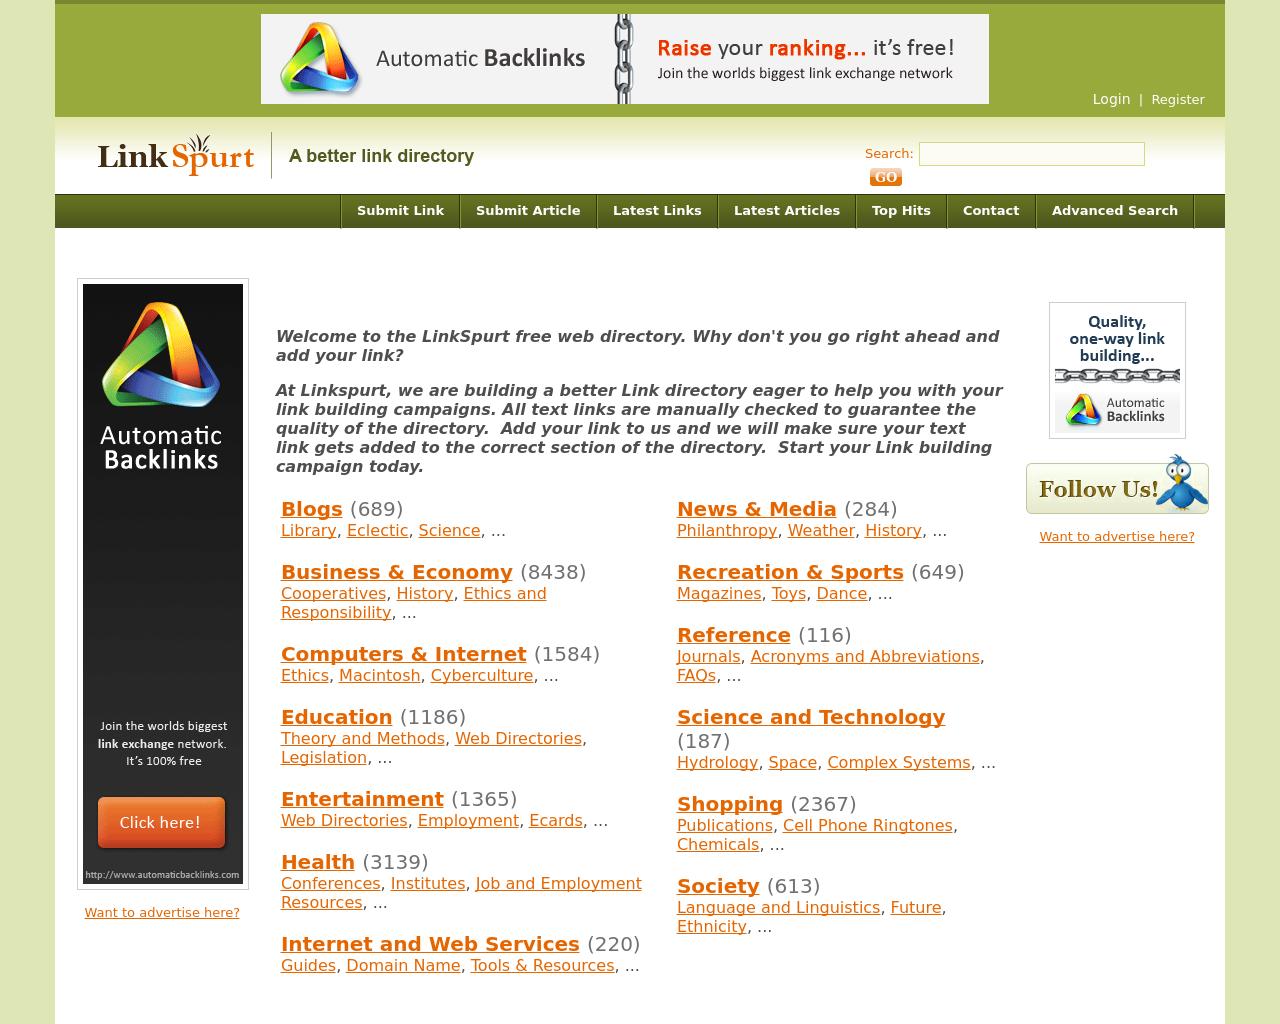 LinkSpurt-Advertising-Reviews-Pricing